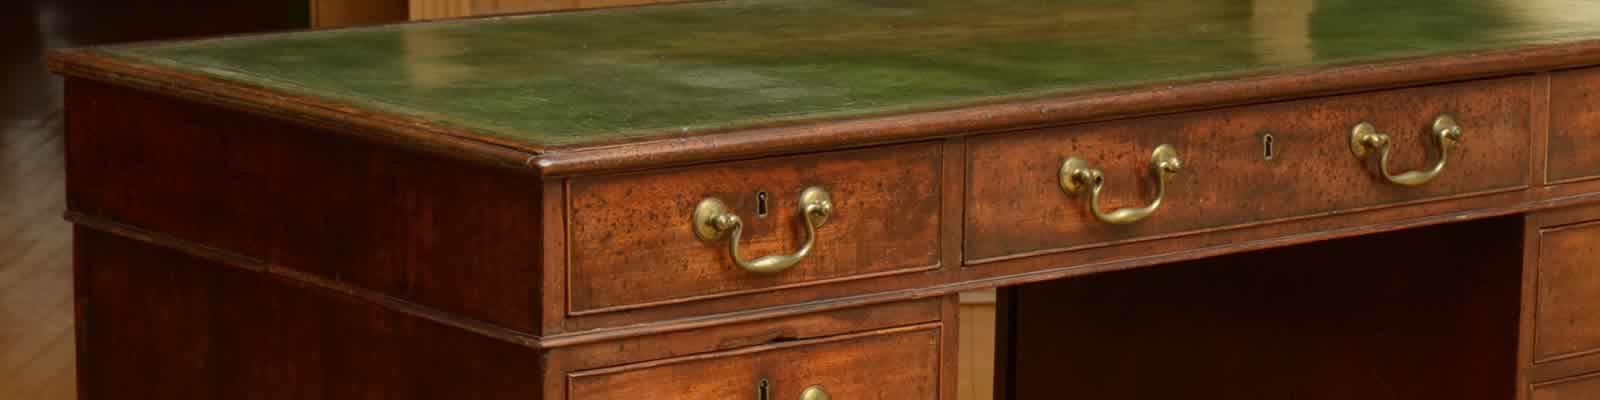 Desk re-leathering Dover